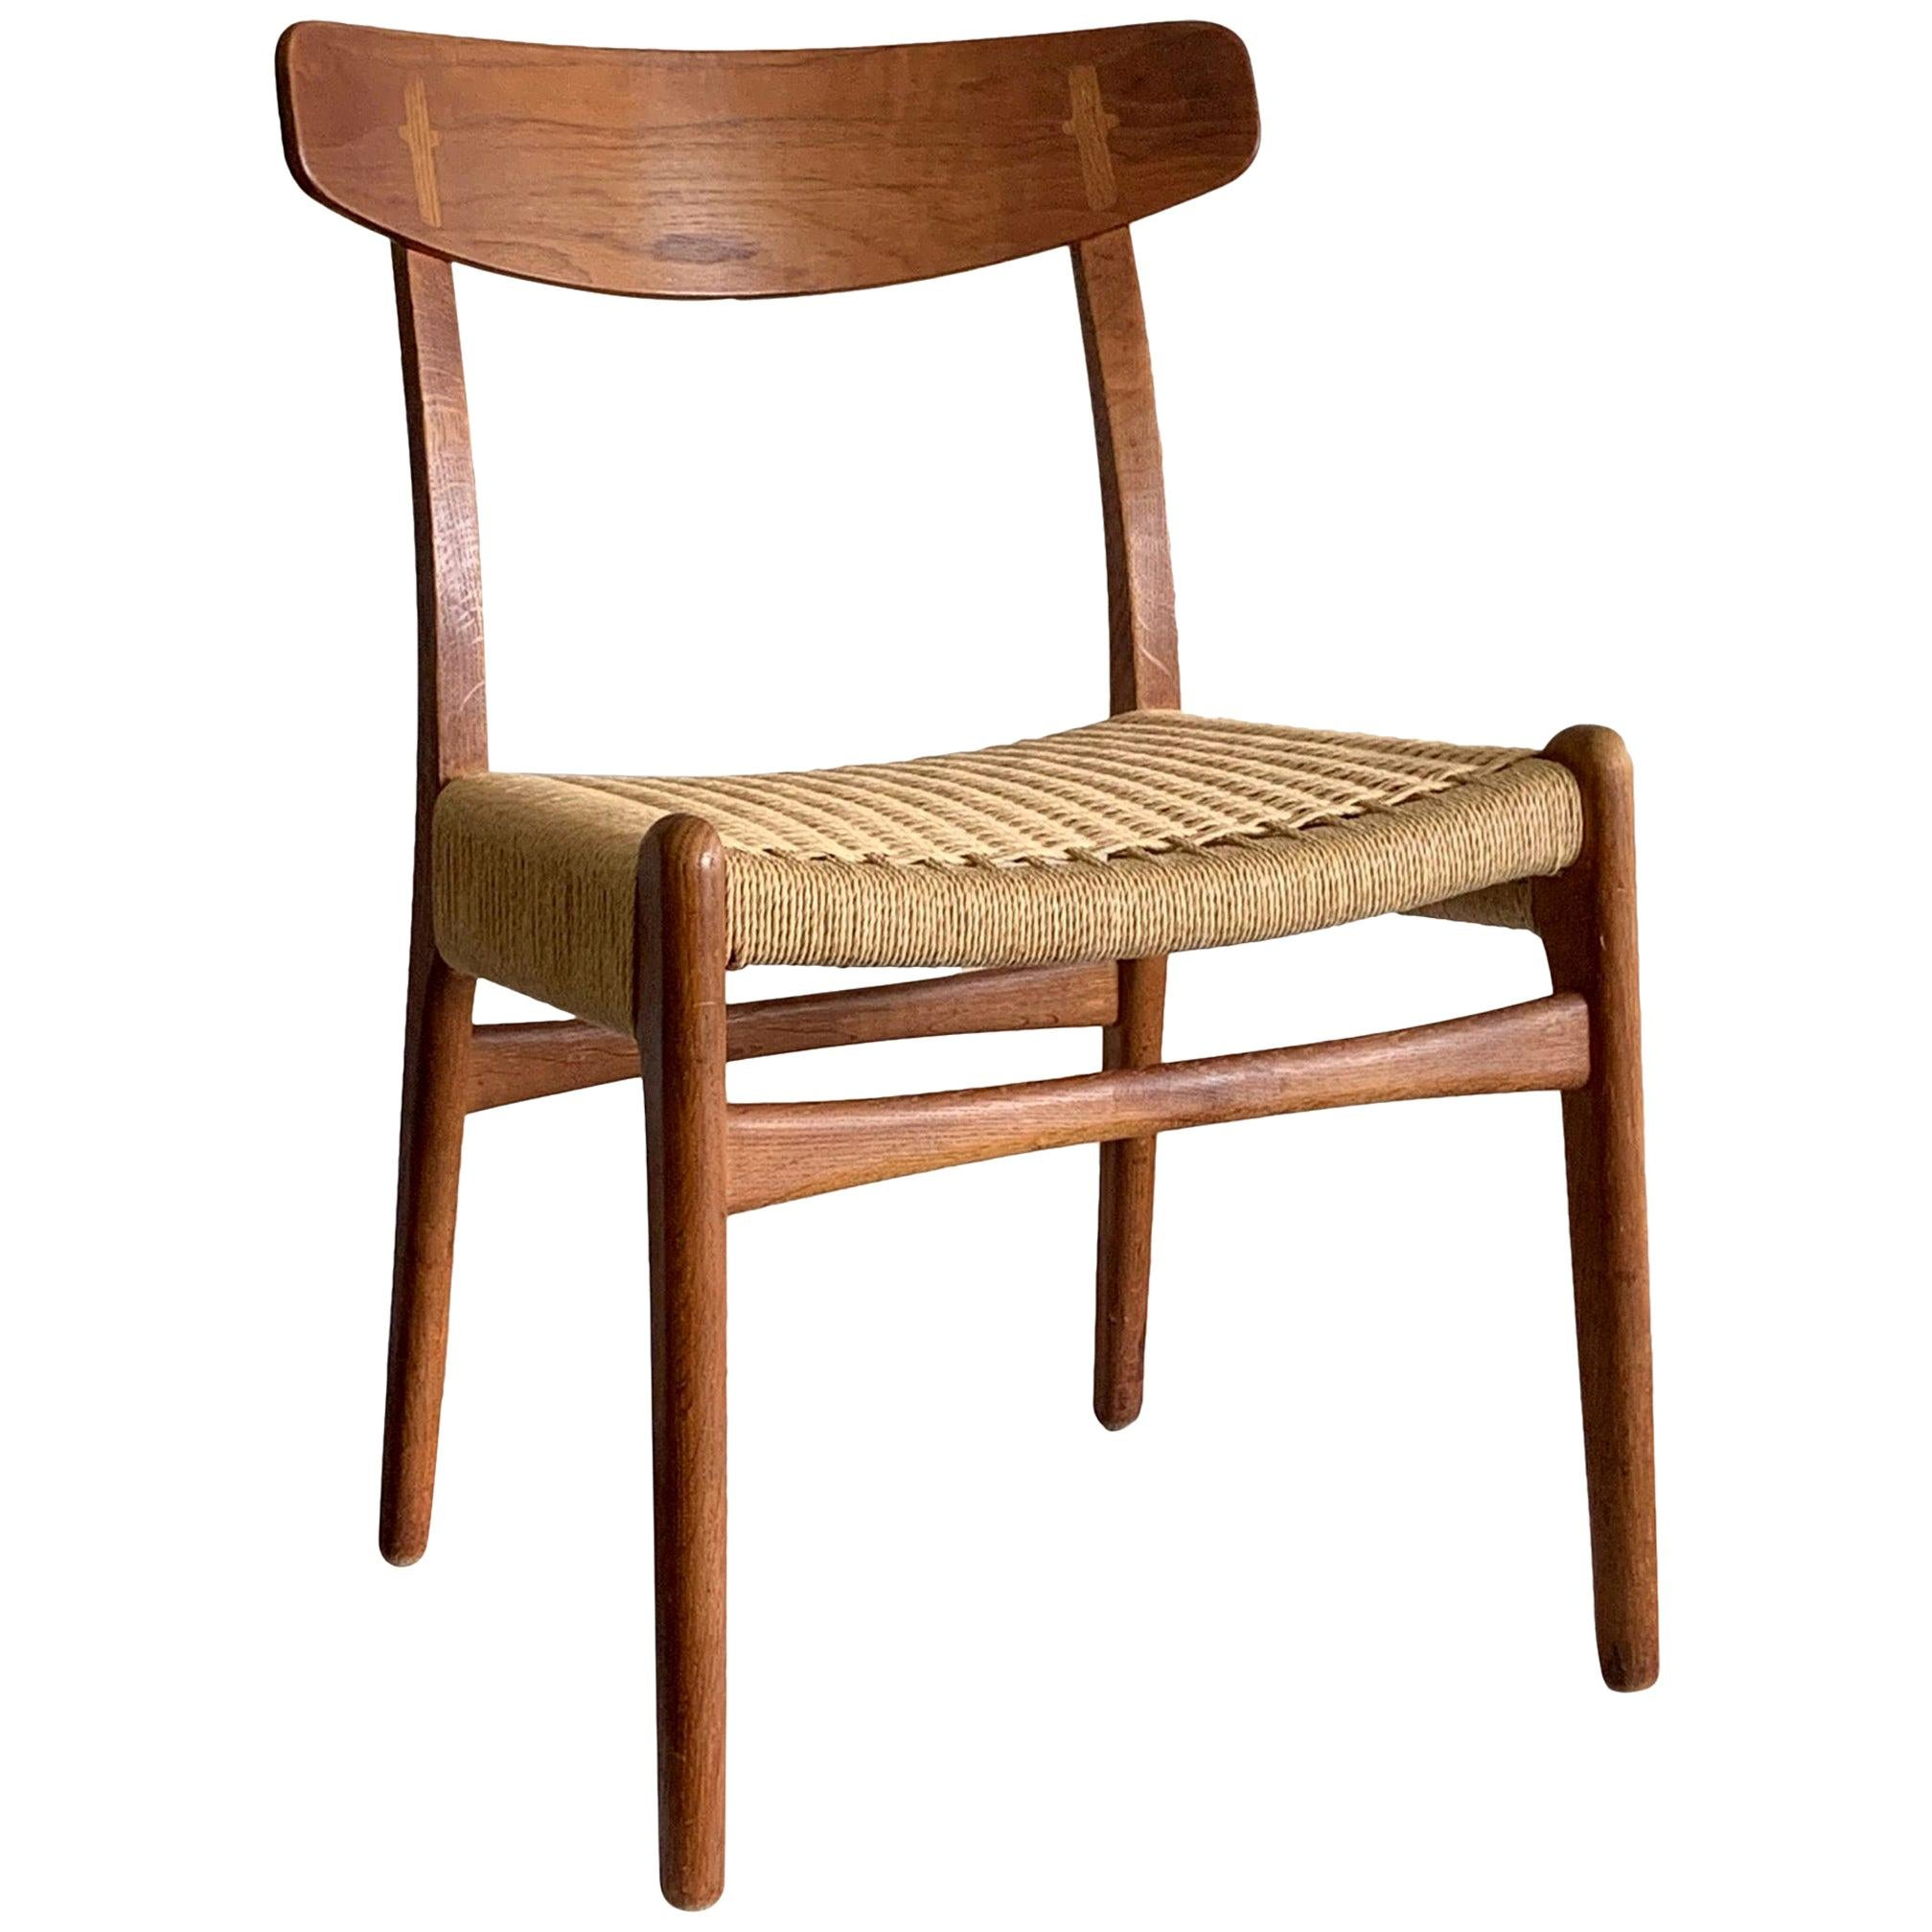 Original Hans Wegner CH 23 Chair